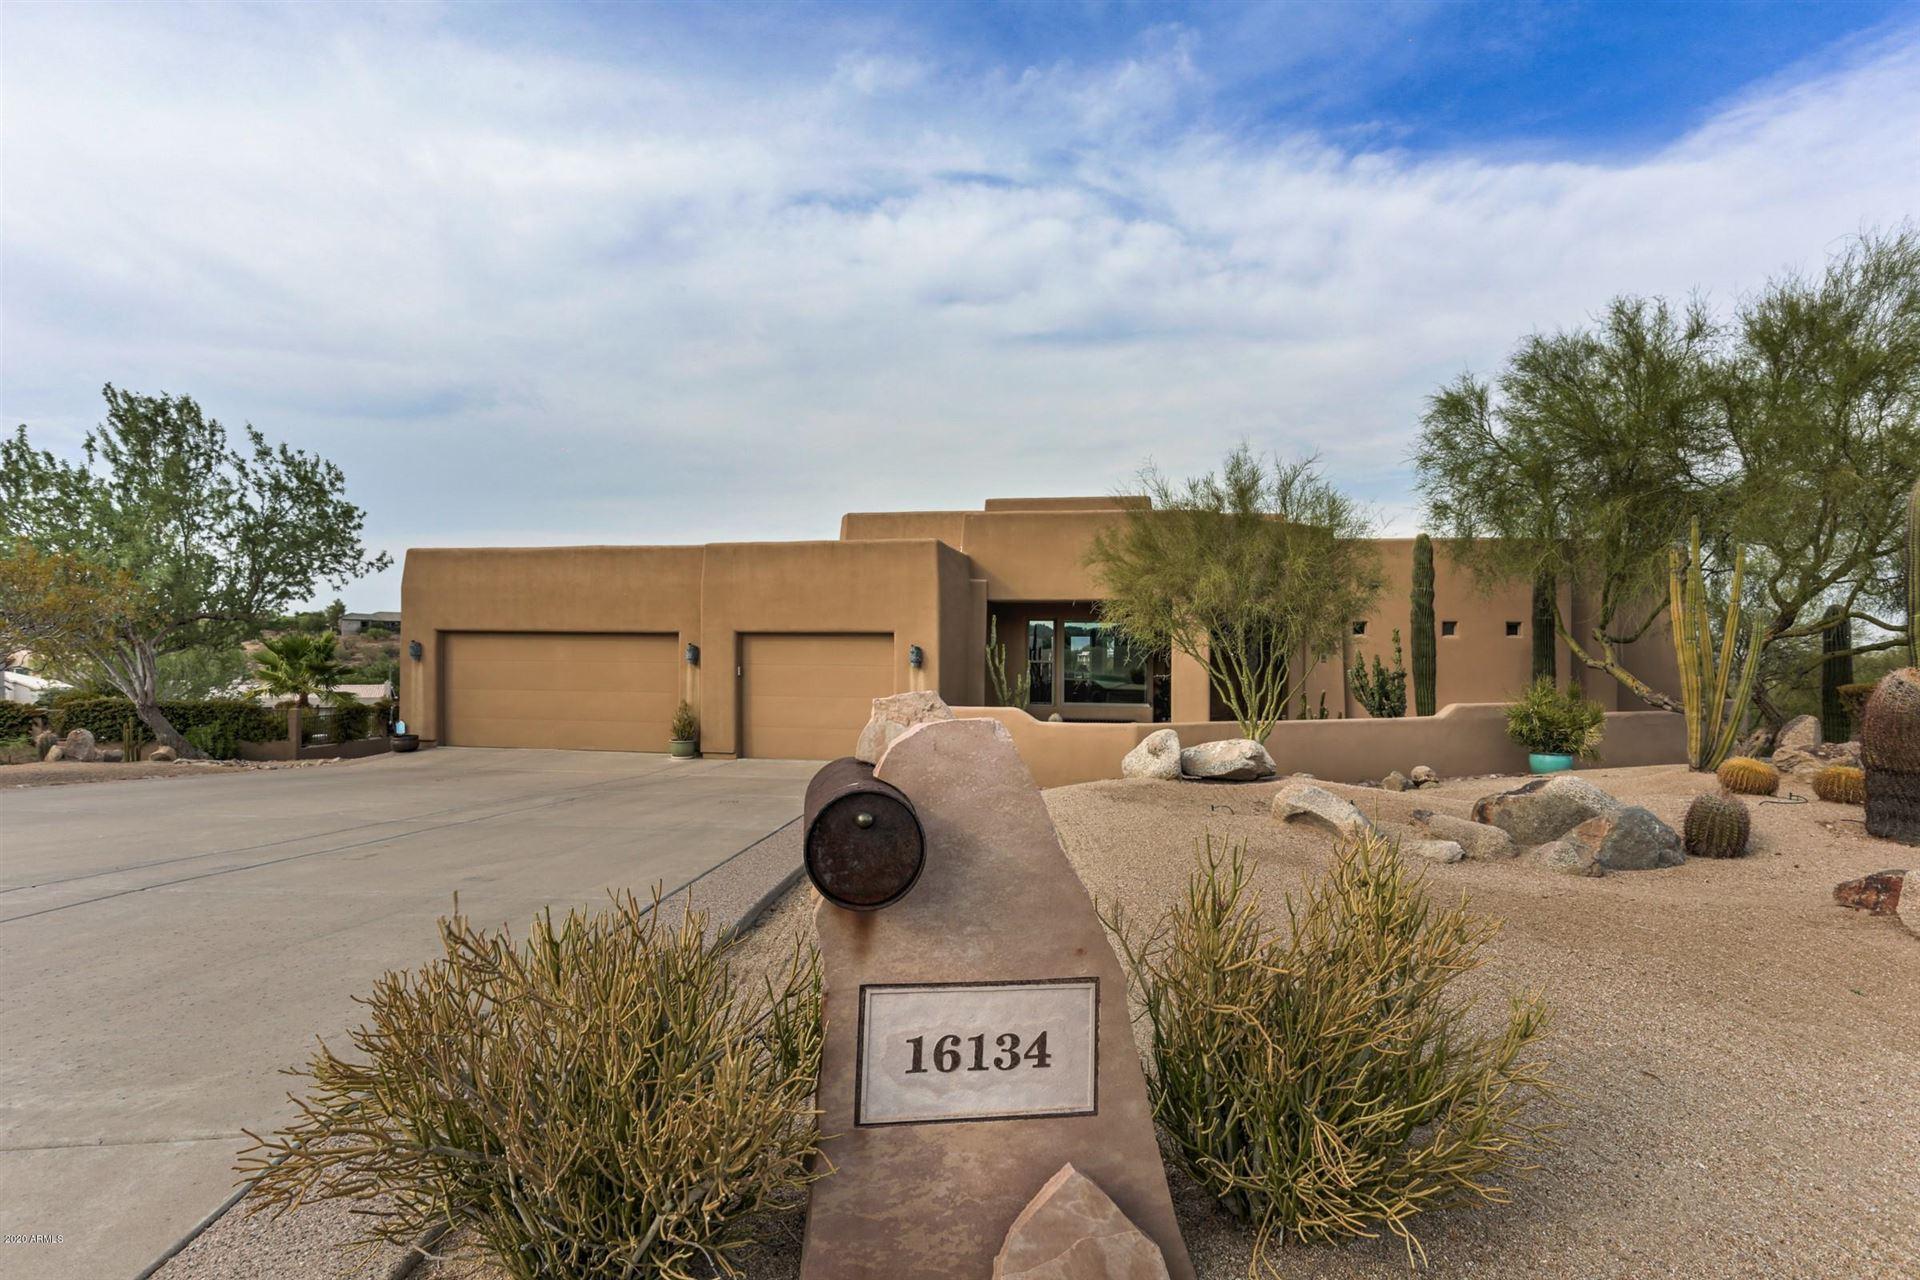 16134 E TREVINO Drive, Fountain Hills, AZ 85268 - MLS#: 6128555